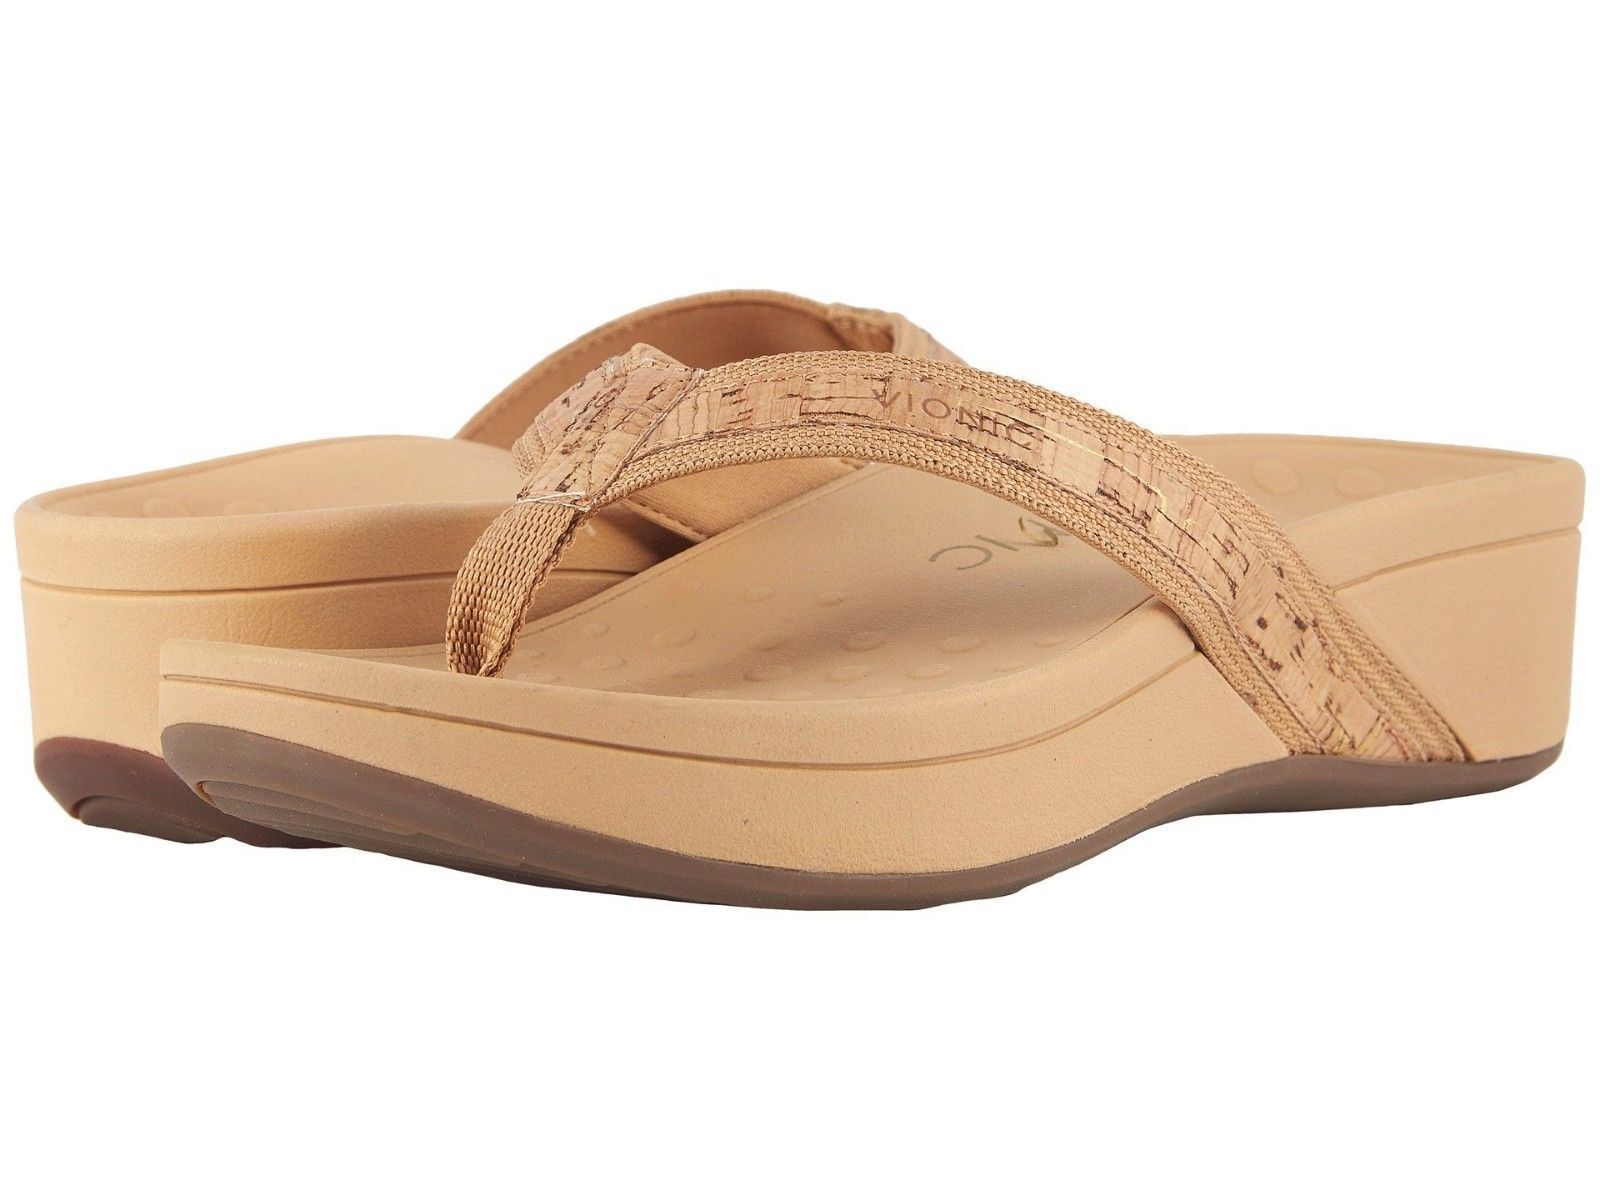 NIB Women's Vionic High Tide Platform Flip Flops Thong Sanda